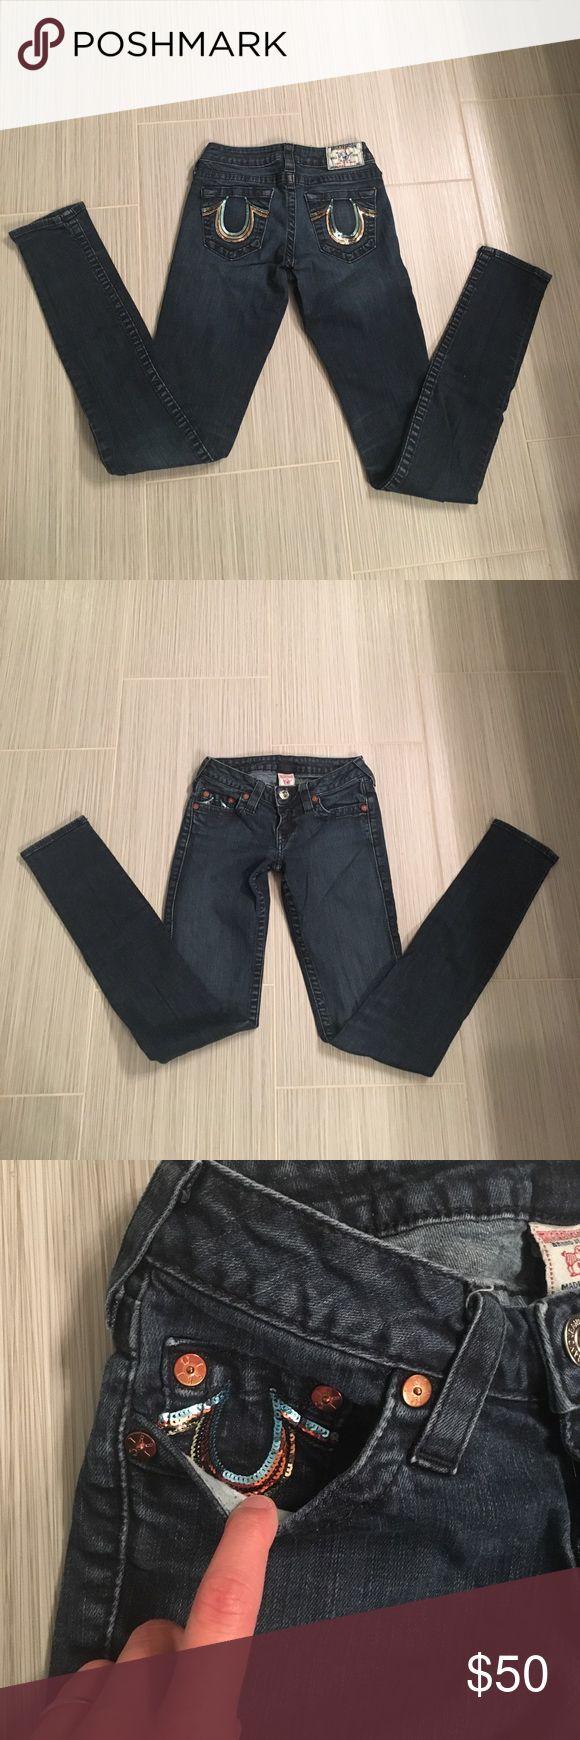 True Religion rainbow sequin skinny jeans True religion jeans with rainbow sequin back pockets. So fun! True Religion Jeans Skinny